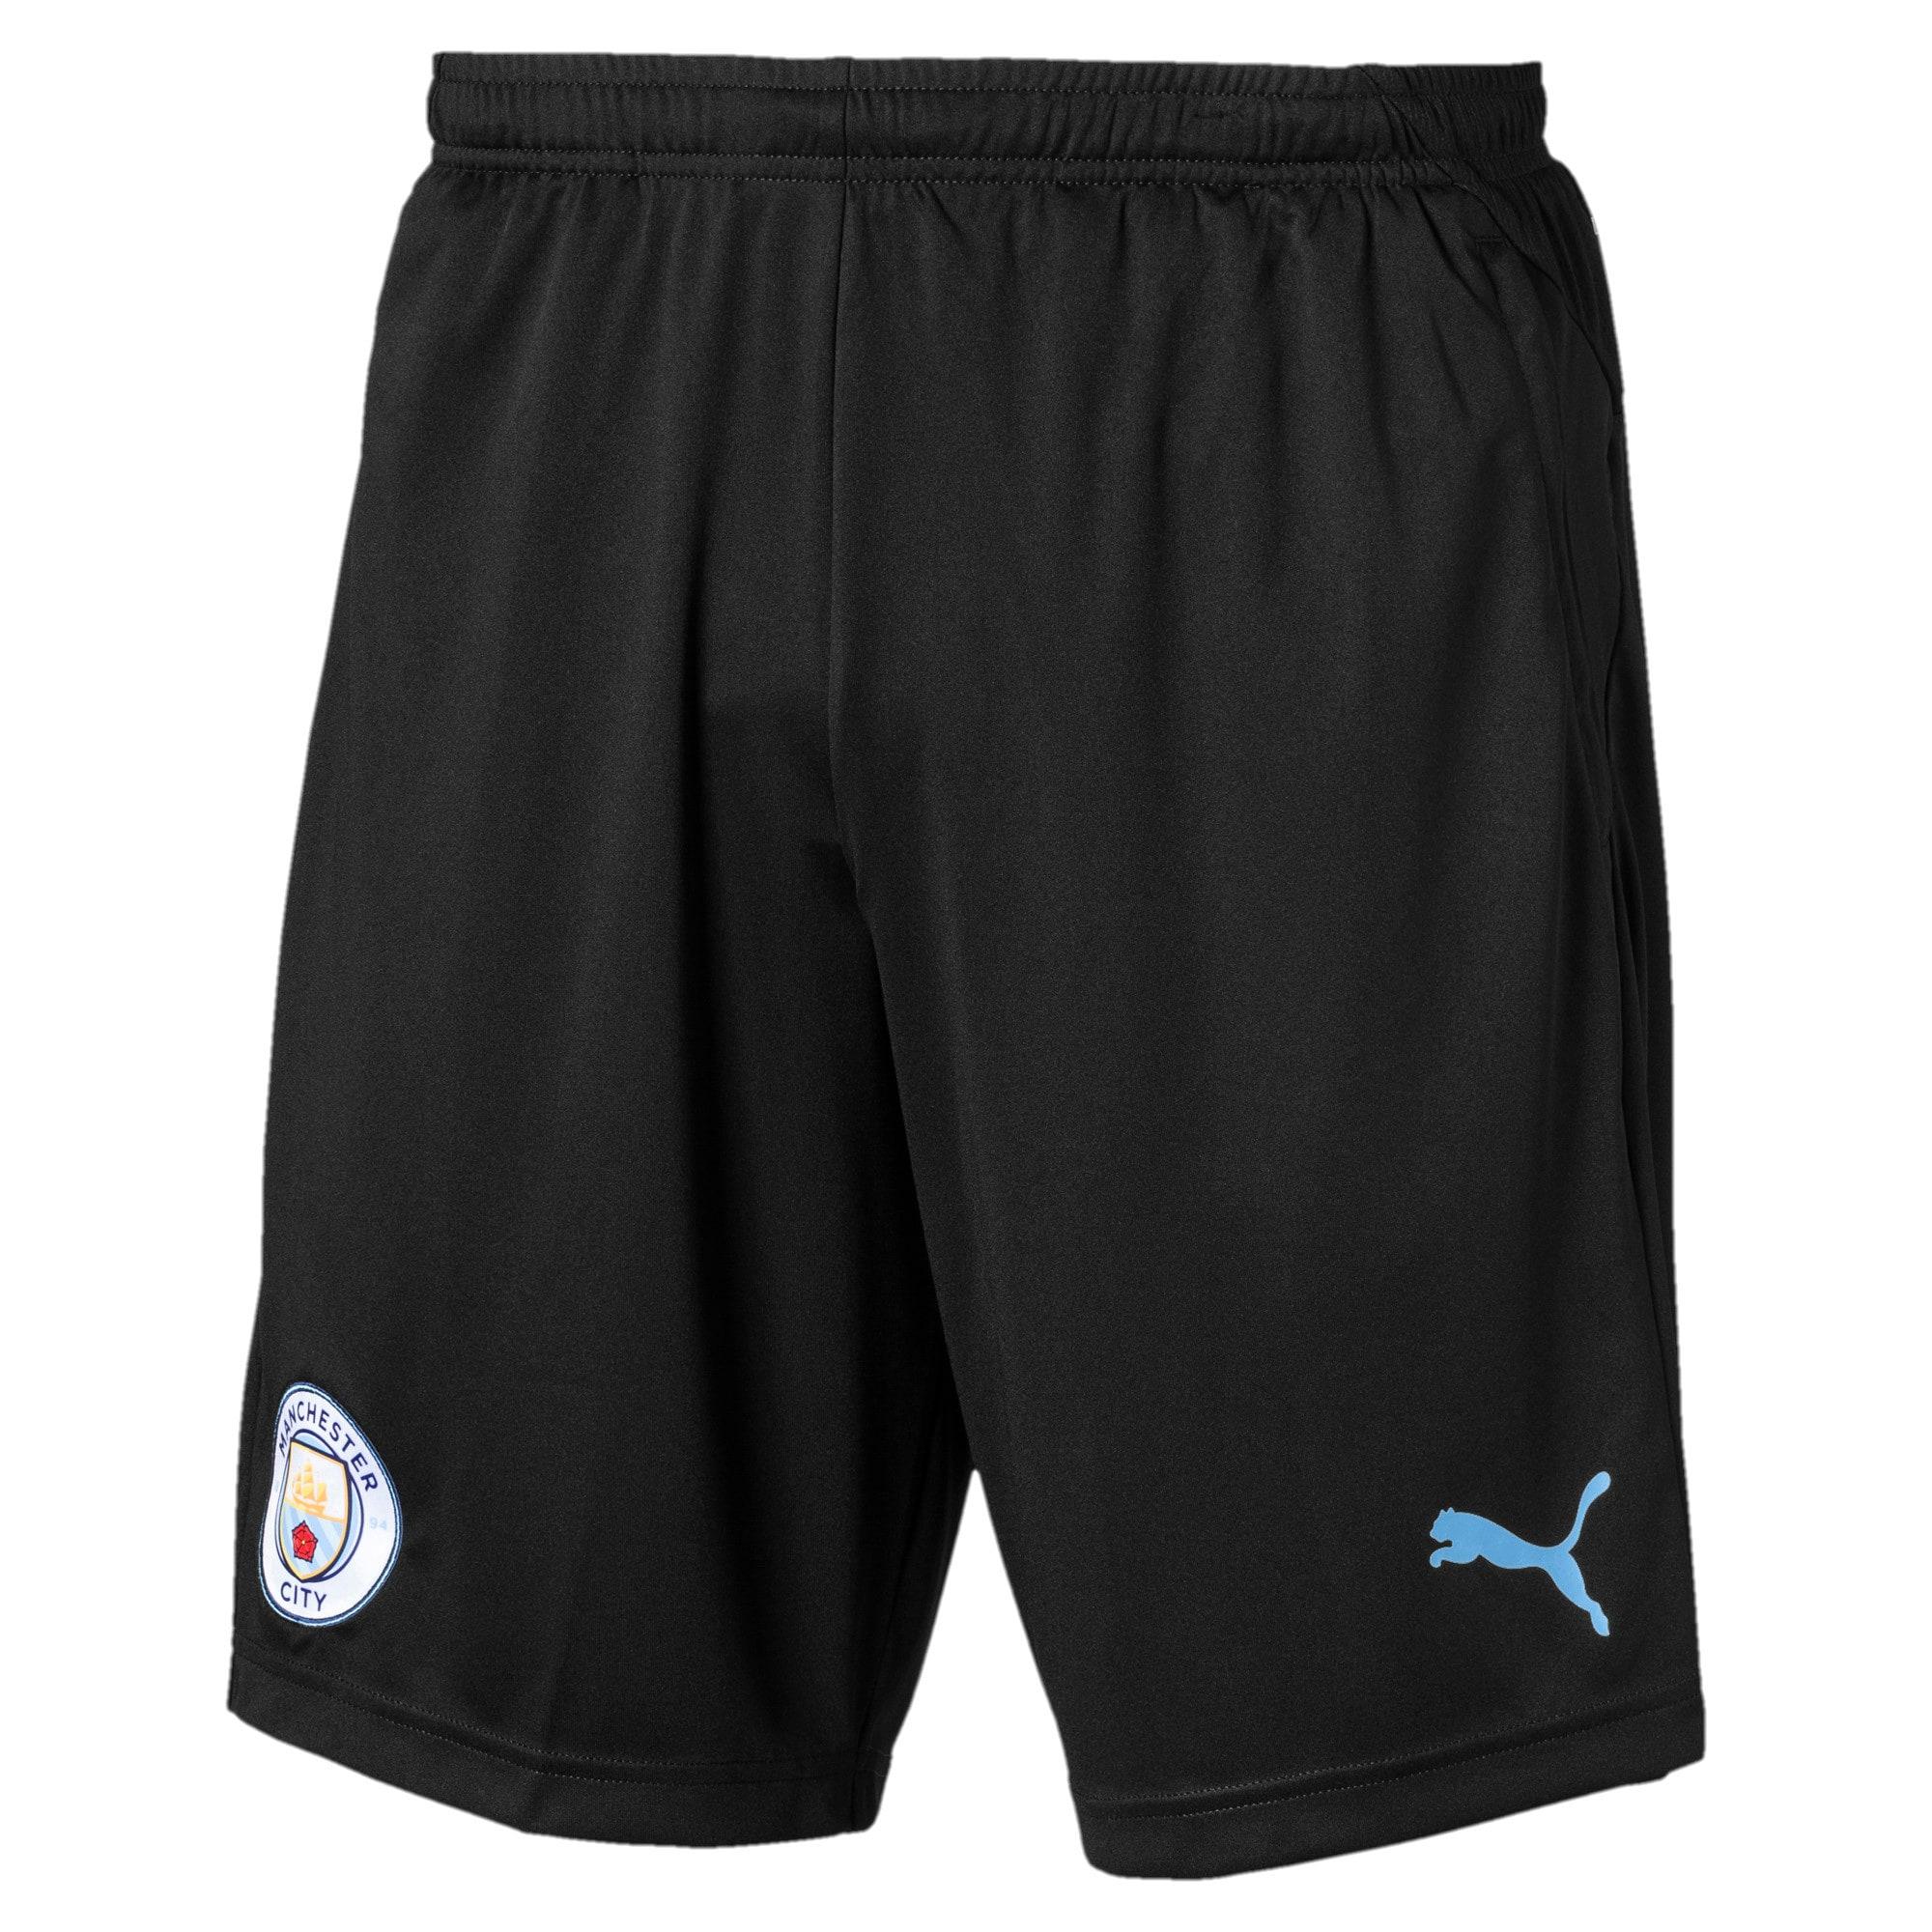 Thumbnail 1 of Manchester City FC Men's Training Shorts, Puma Black-Team Light Blue, medium